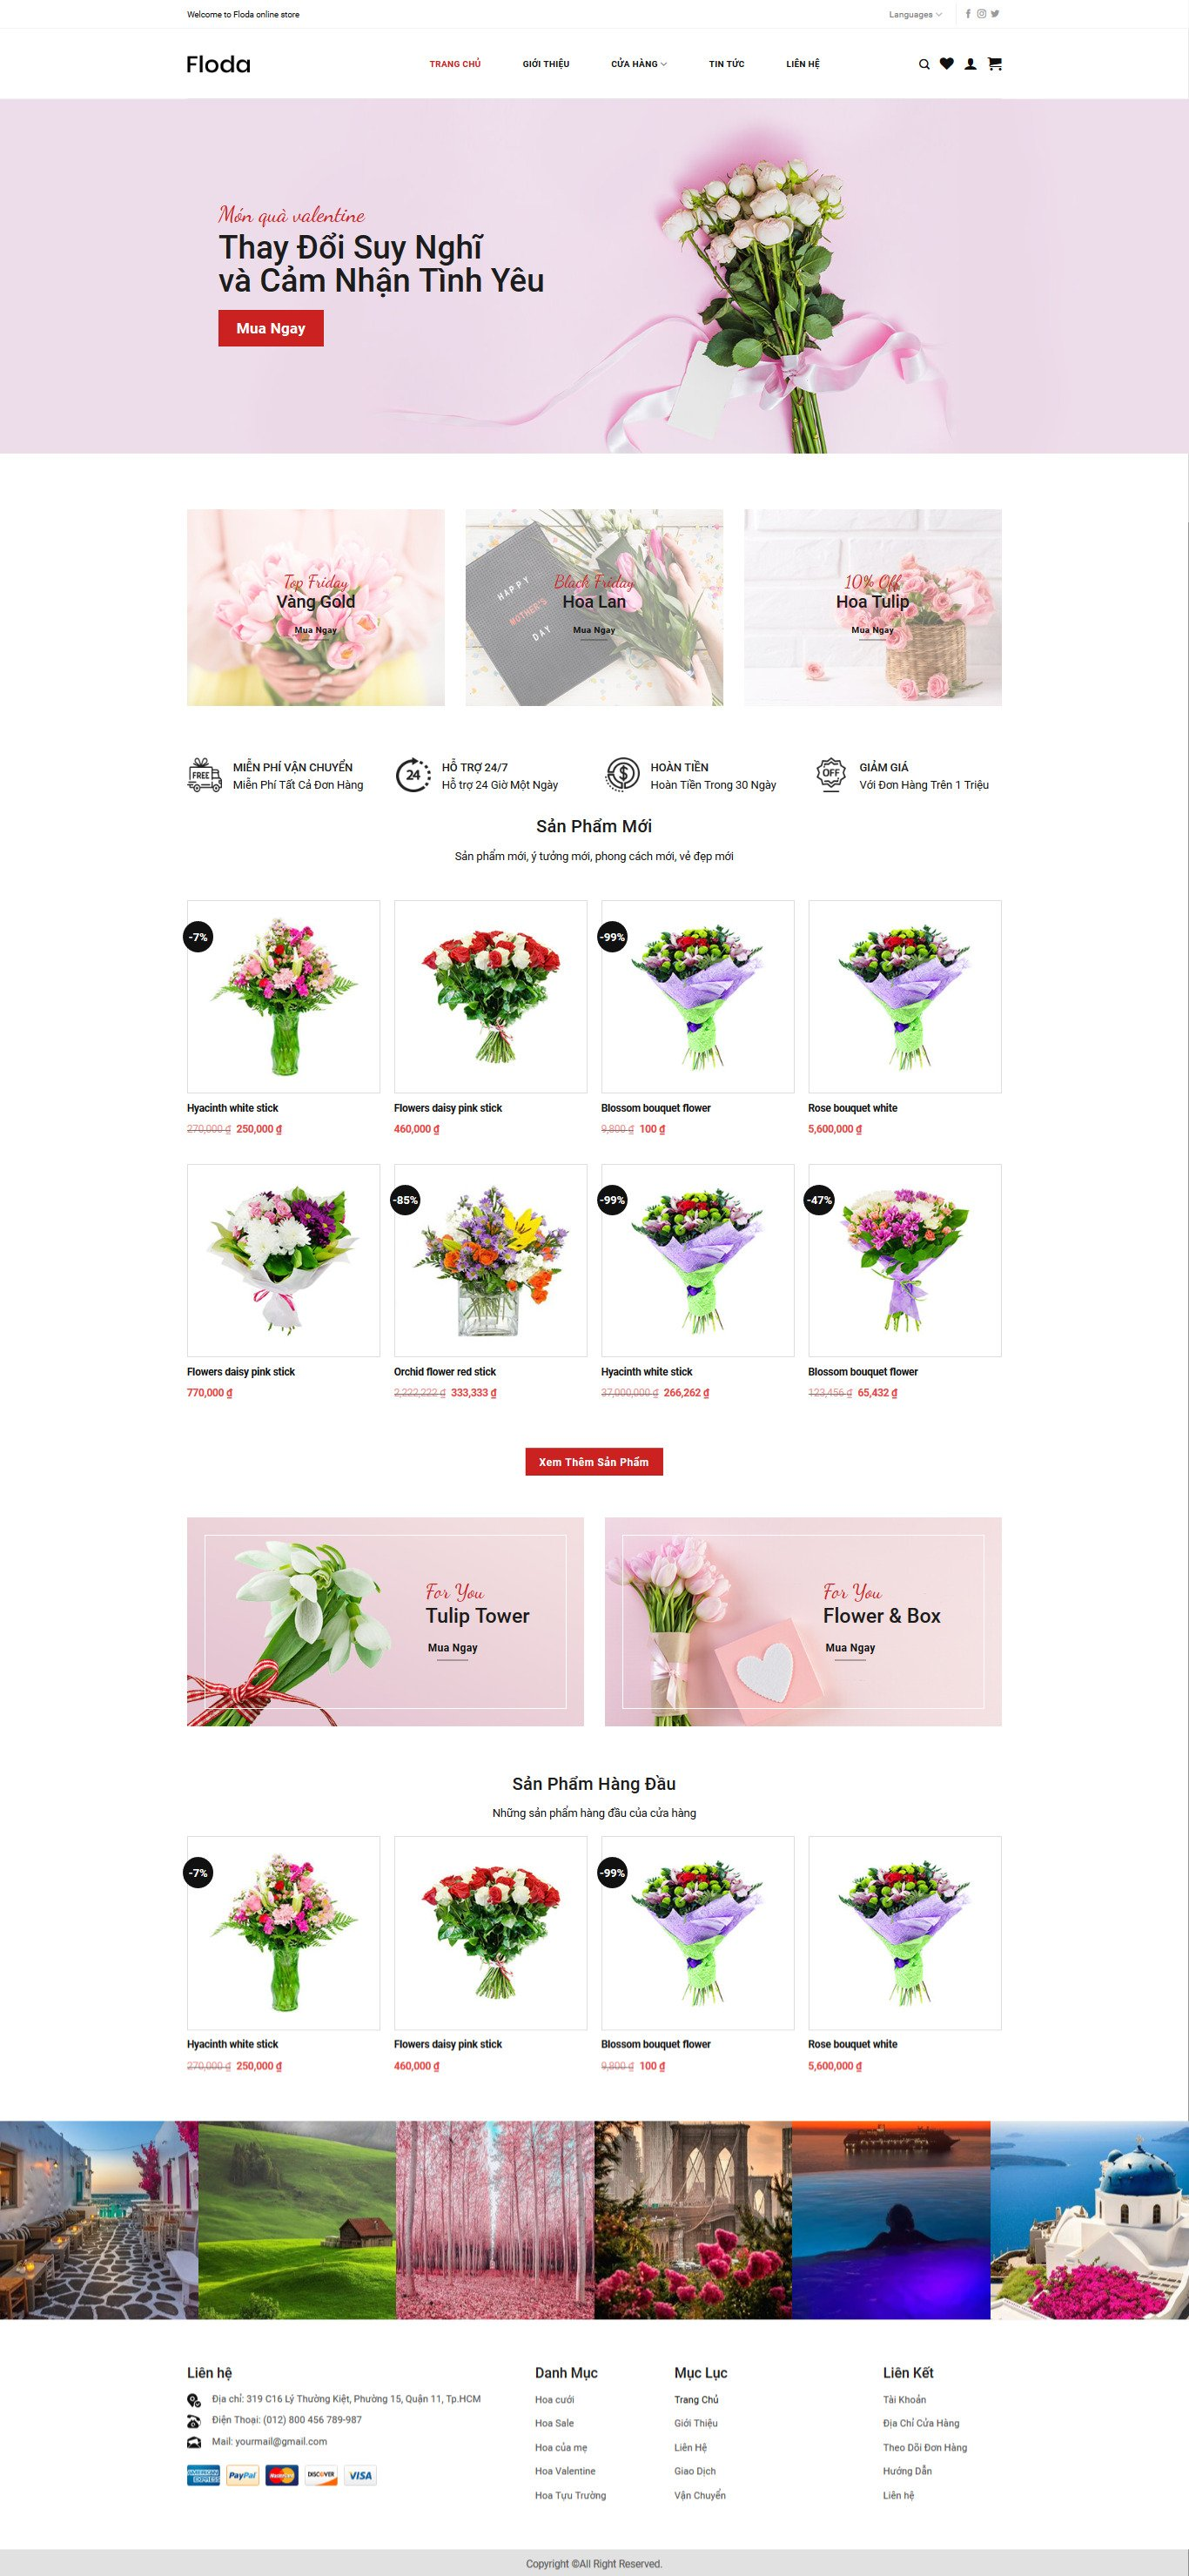 Mẫu website bán hoa giao diện